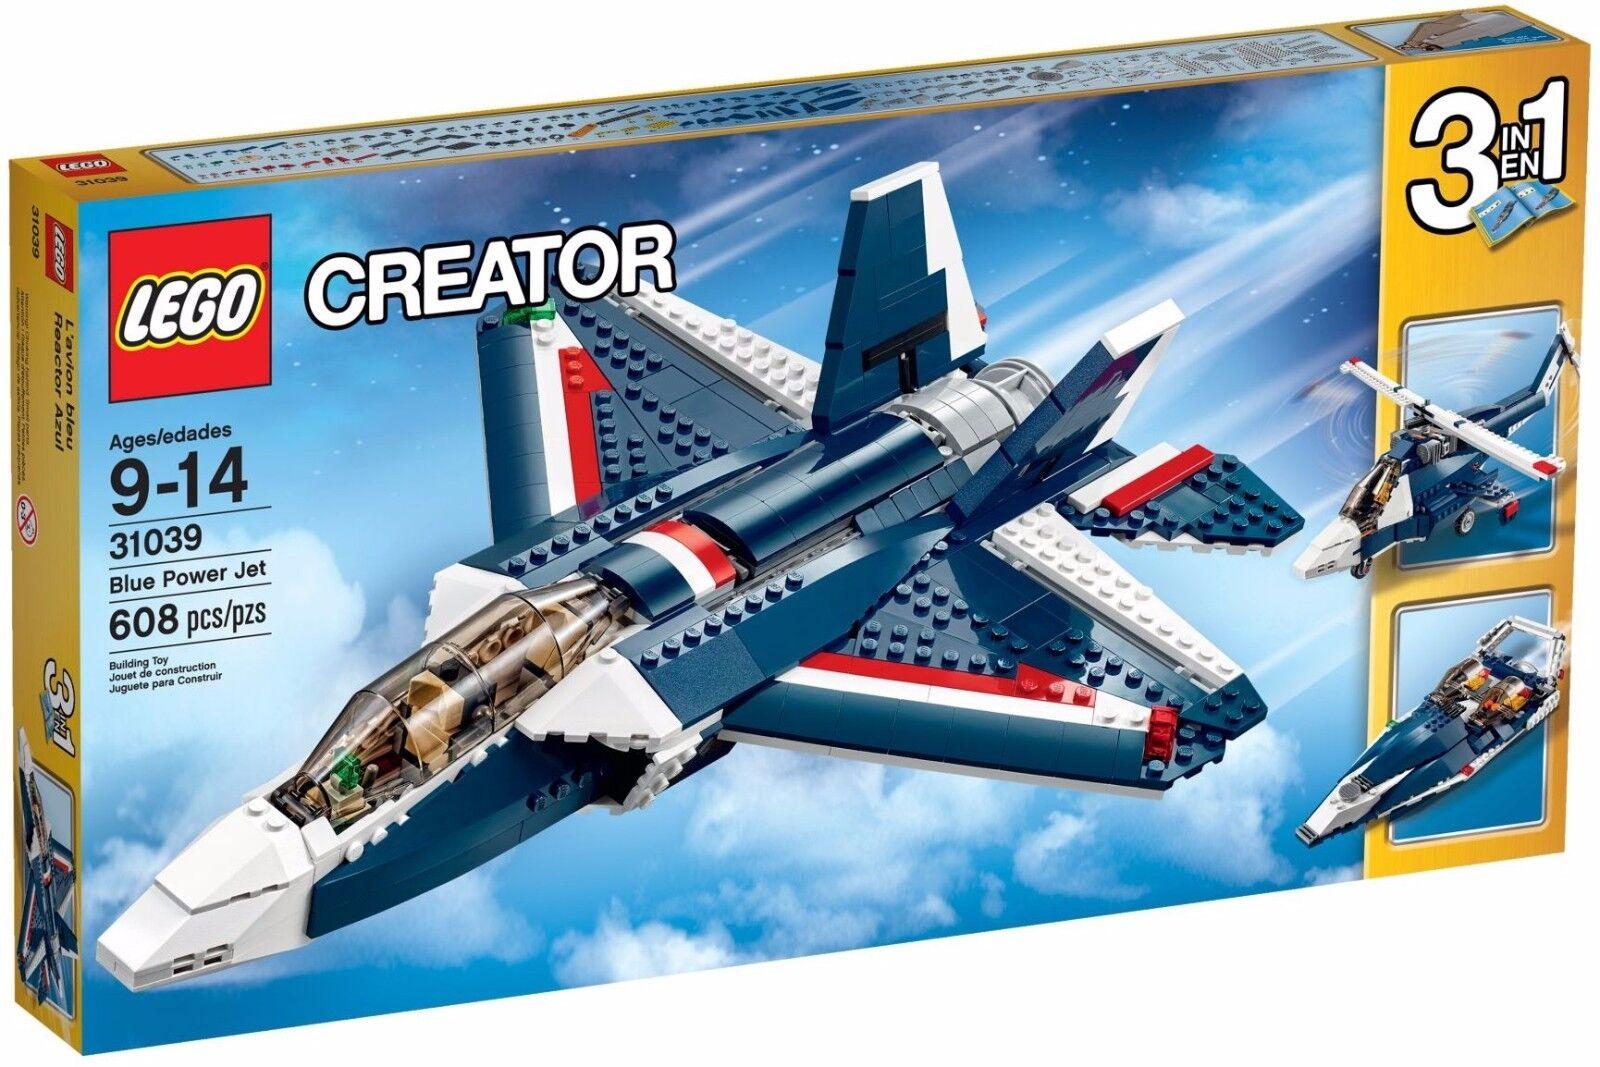 LEGO Creator bluee Power Jet 3in1()(Retired 2015)(Rare)(NEW)